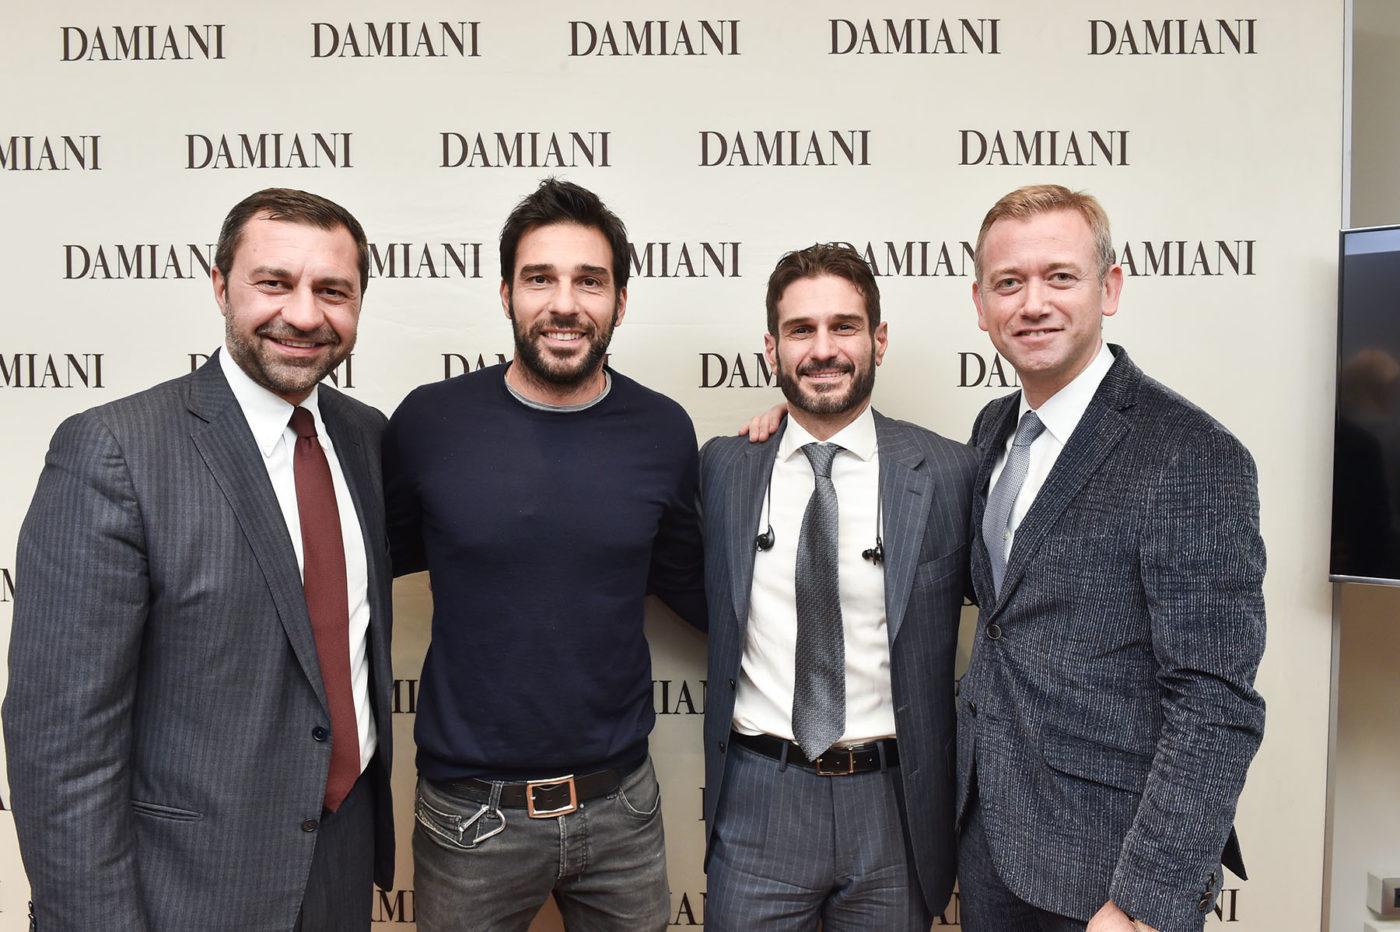 DamianiMicrosoft-4